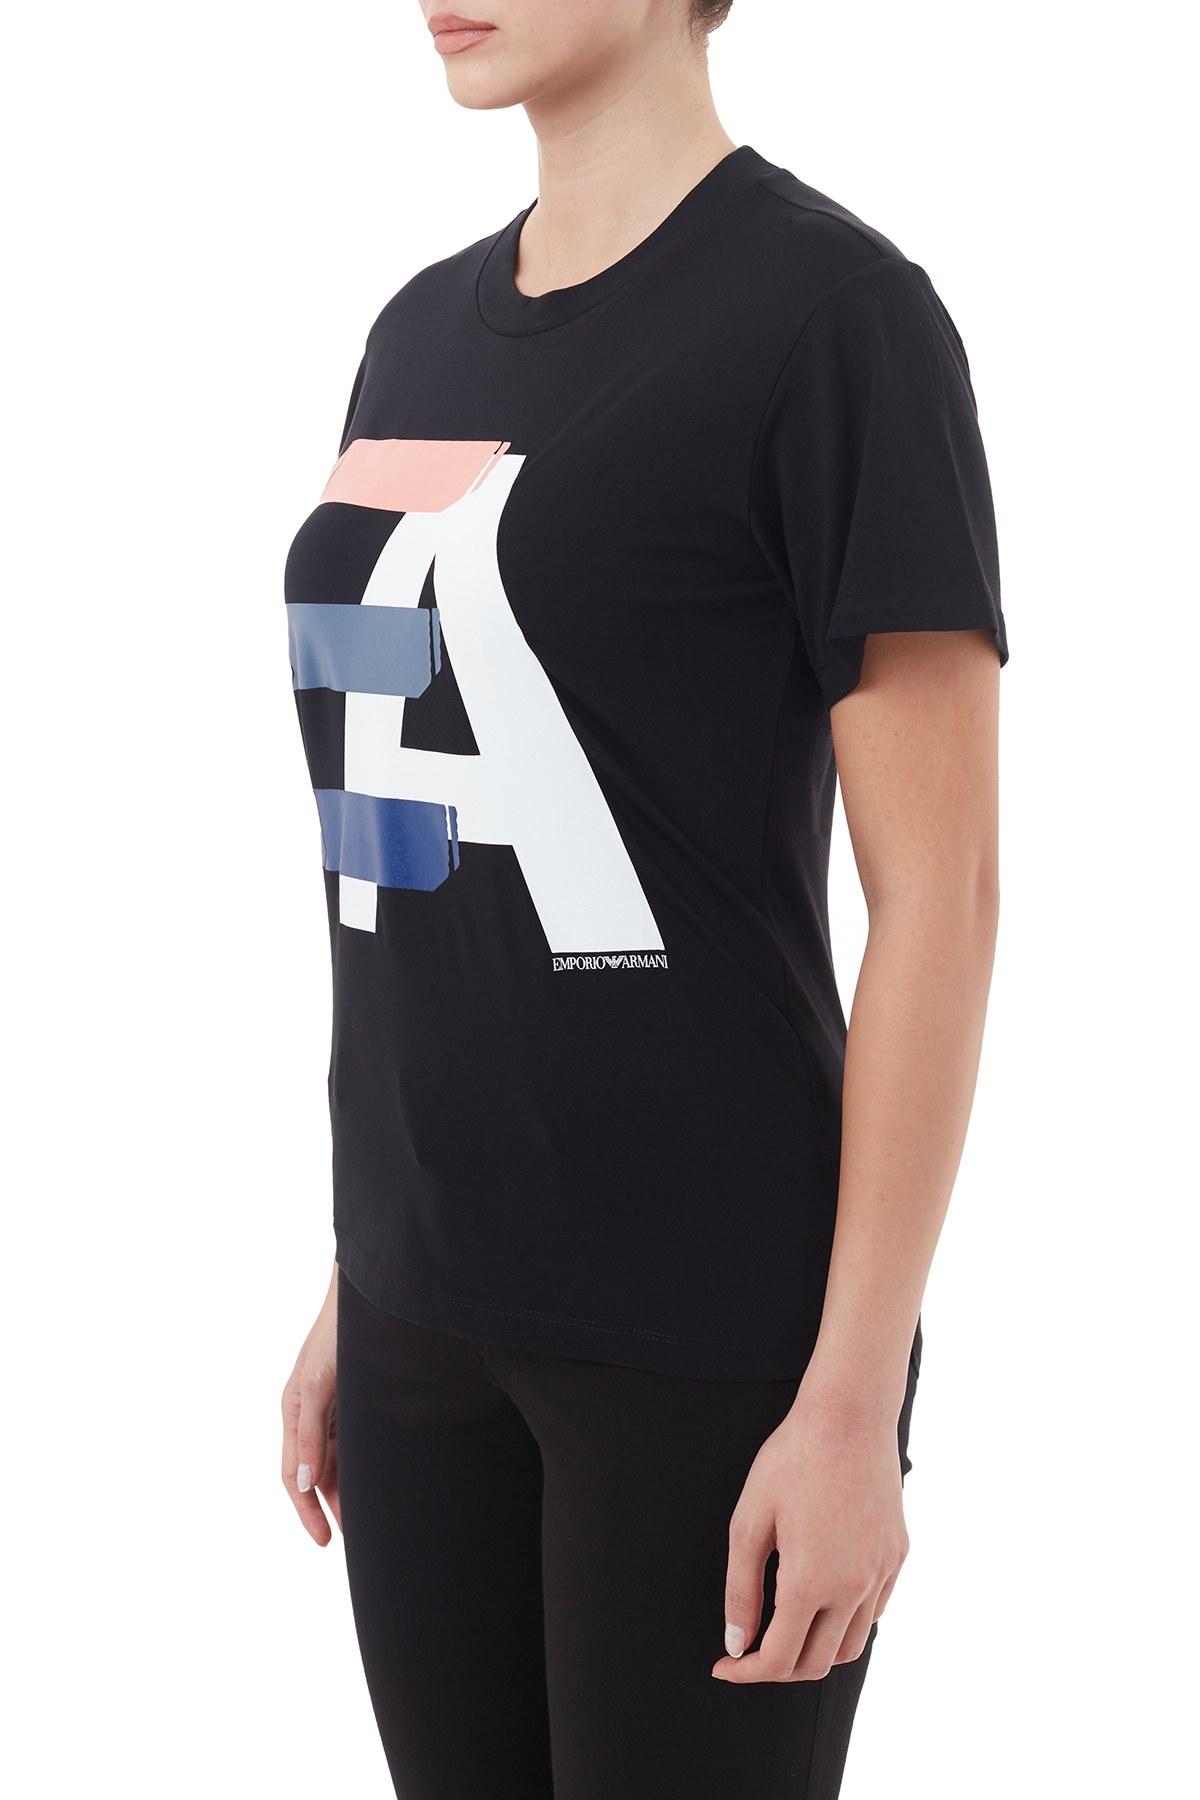 Emporio Armani Pamuklu Bisiklet Yaka Bayan T Shirt 6H2T7I 2J07Z 0999 SİYAH